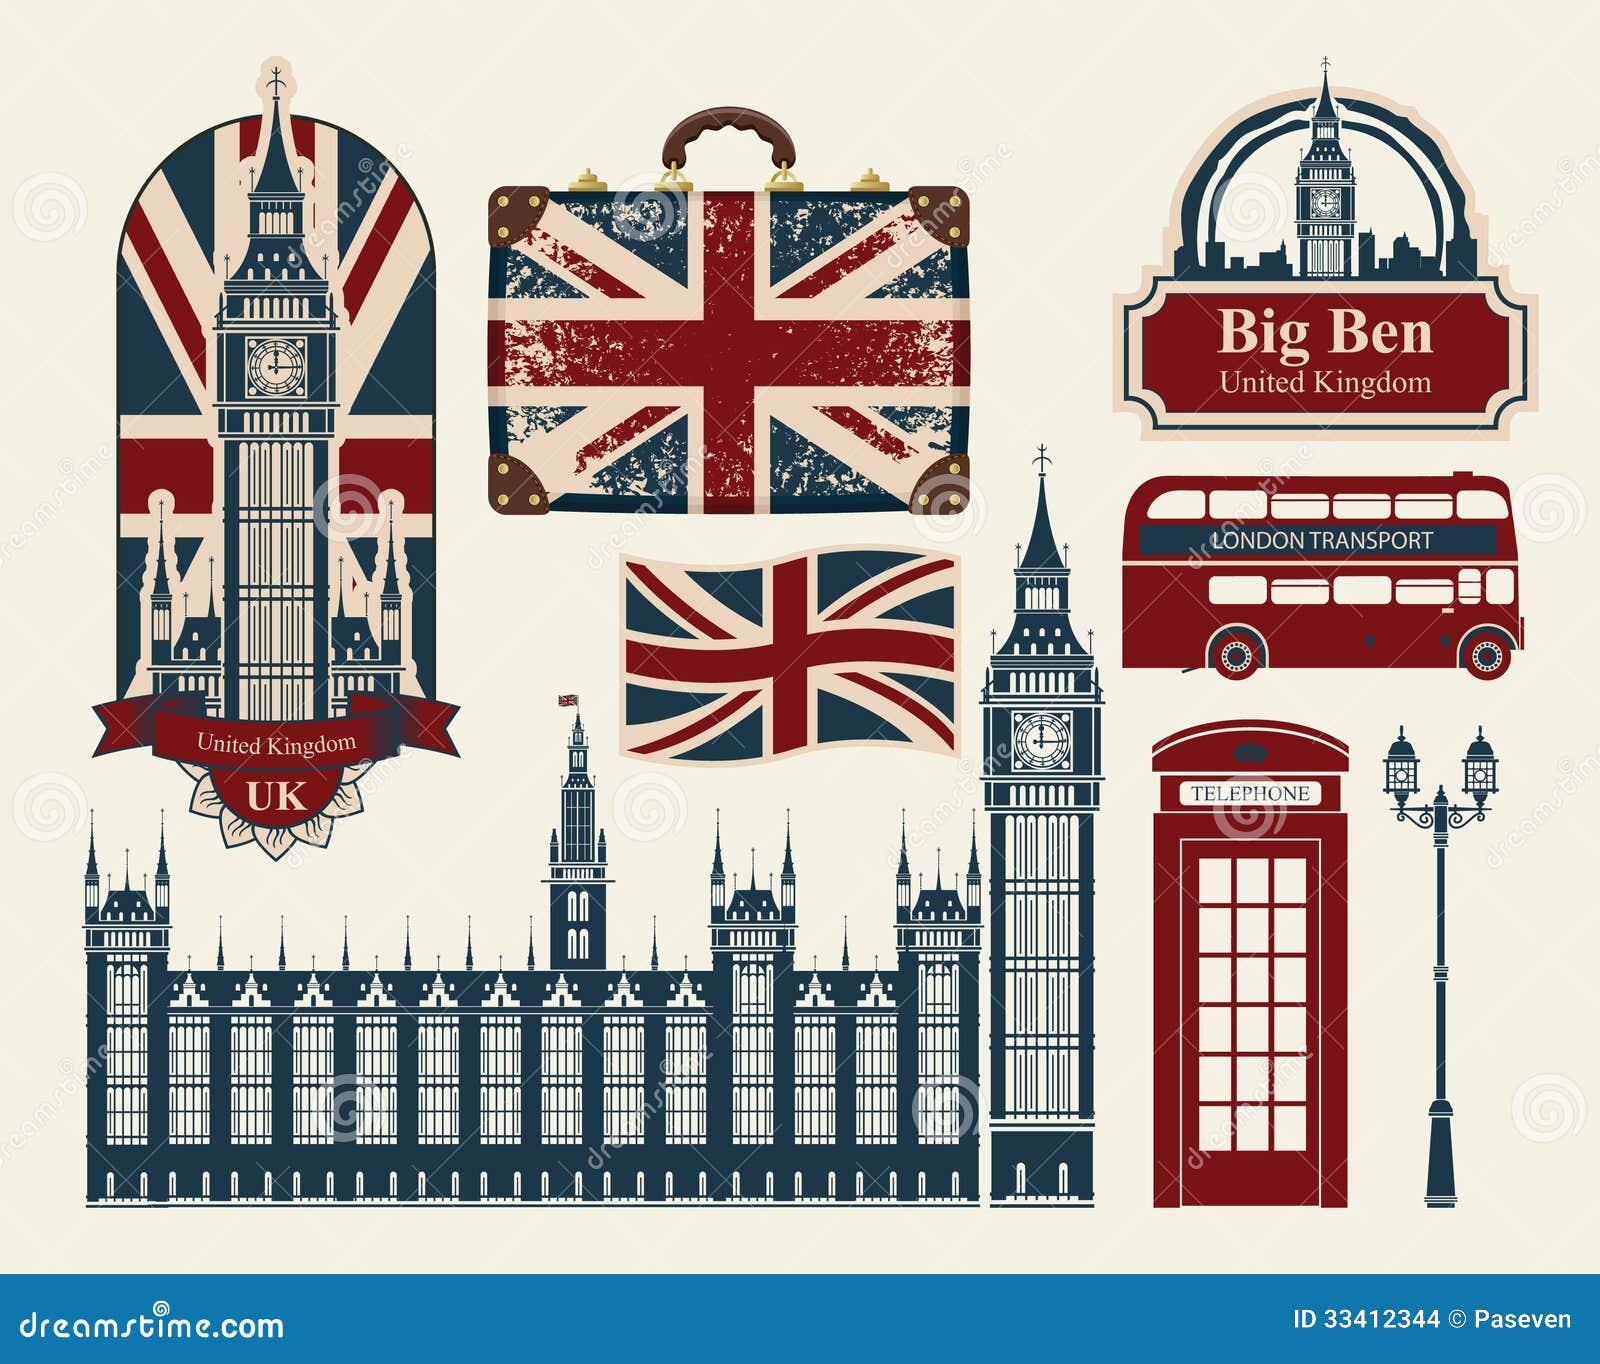 Поделка на тему лондон